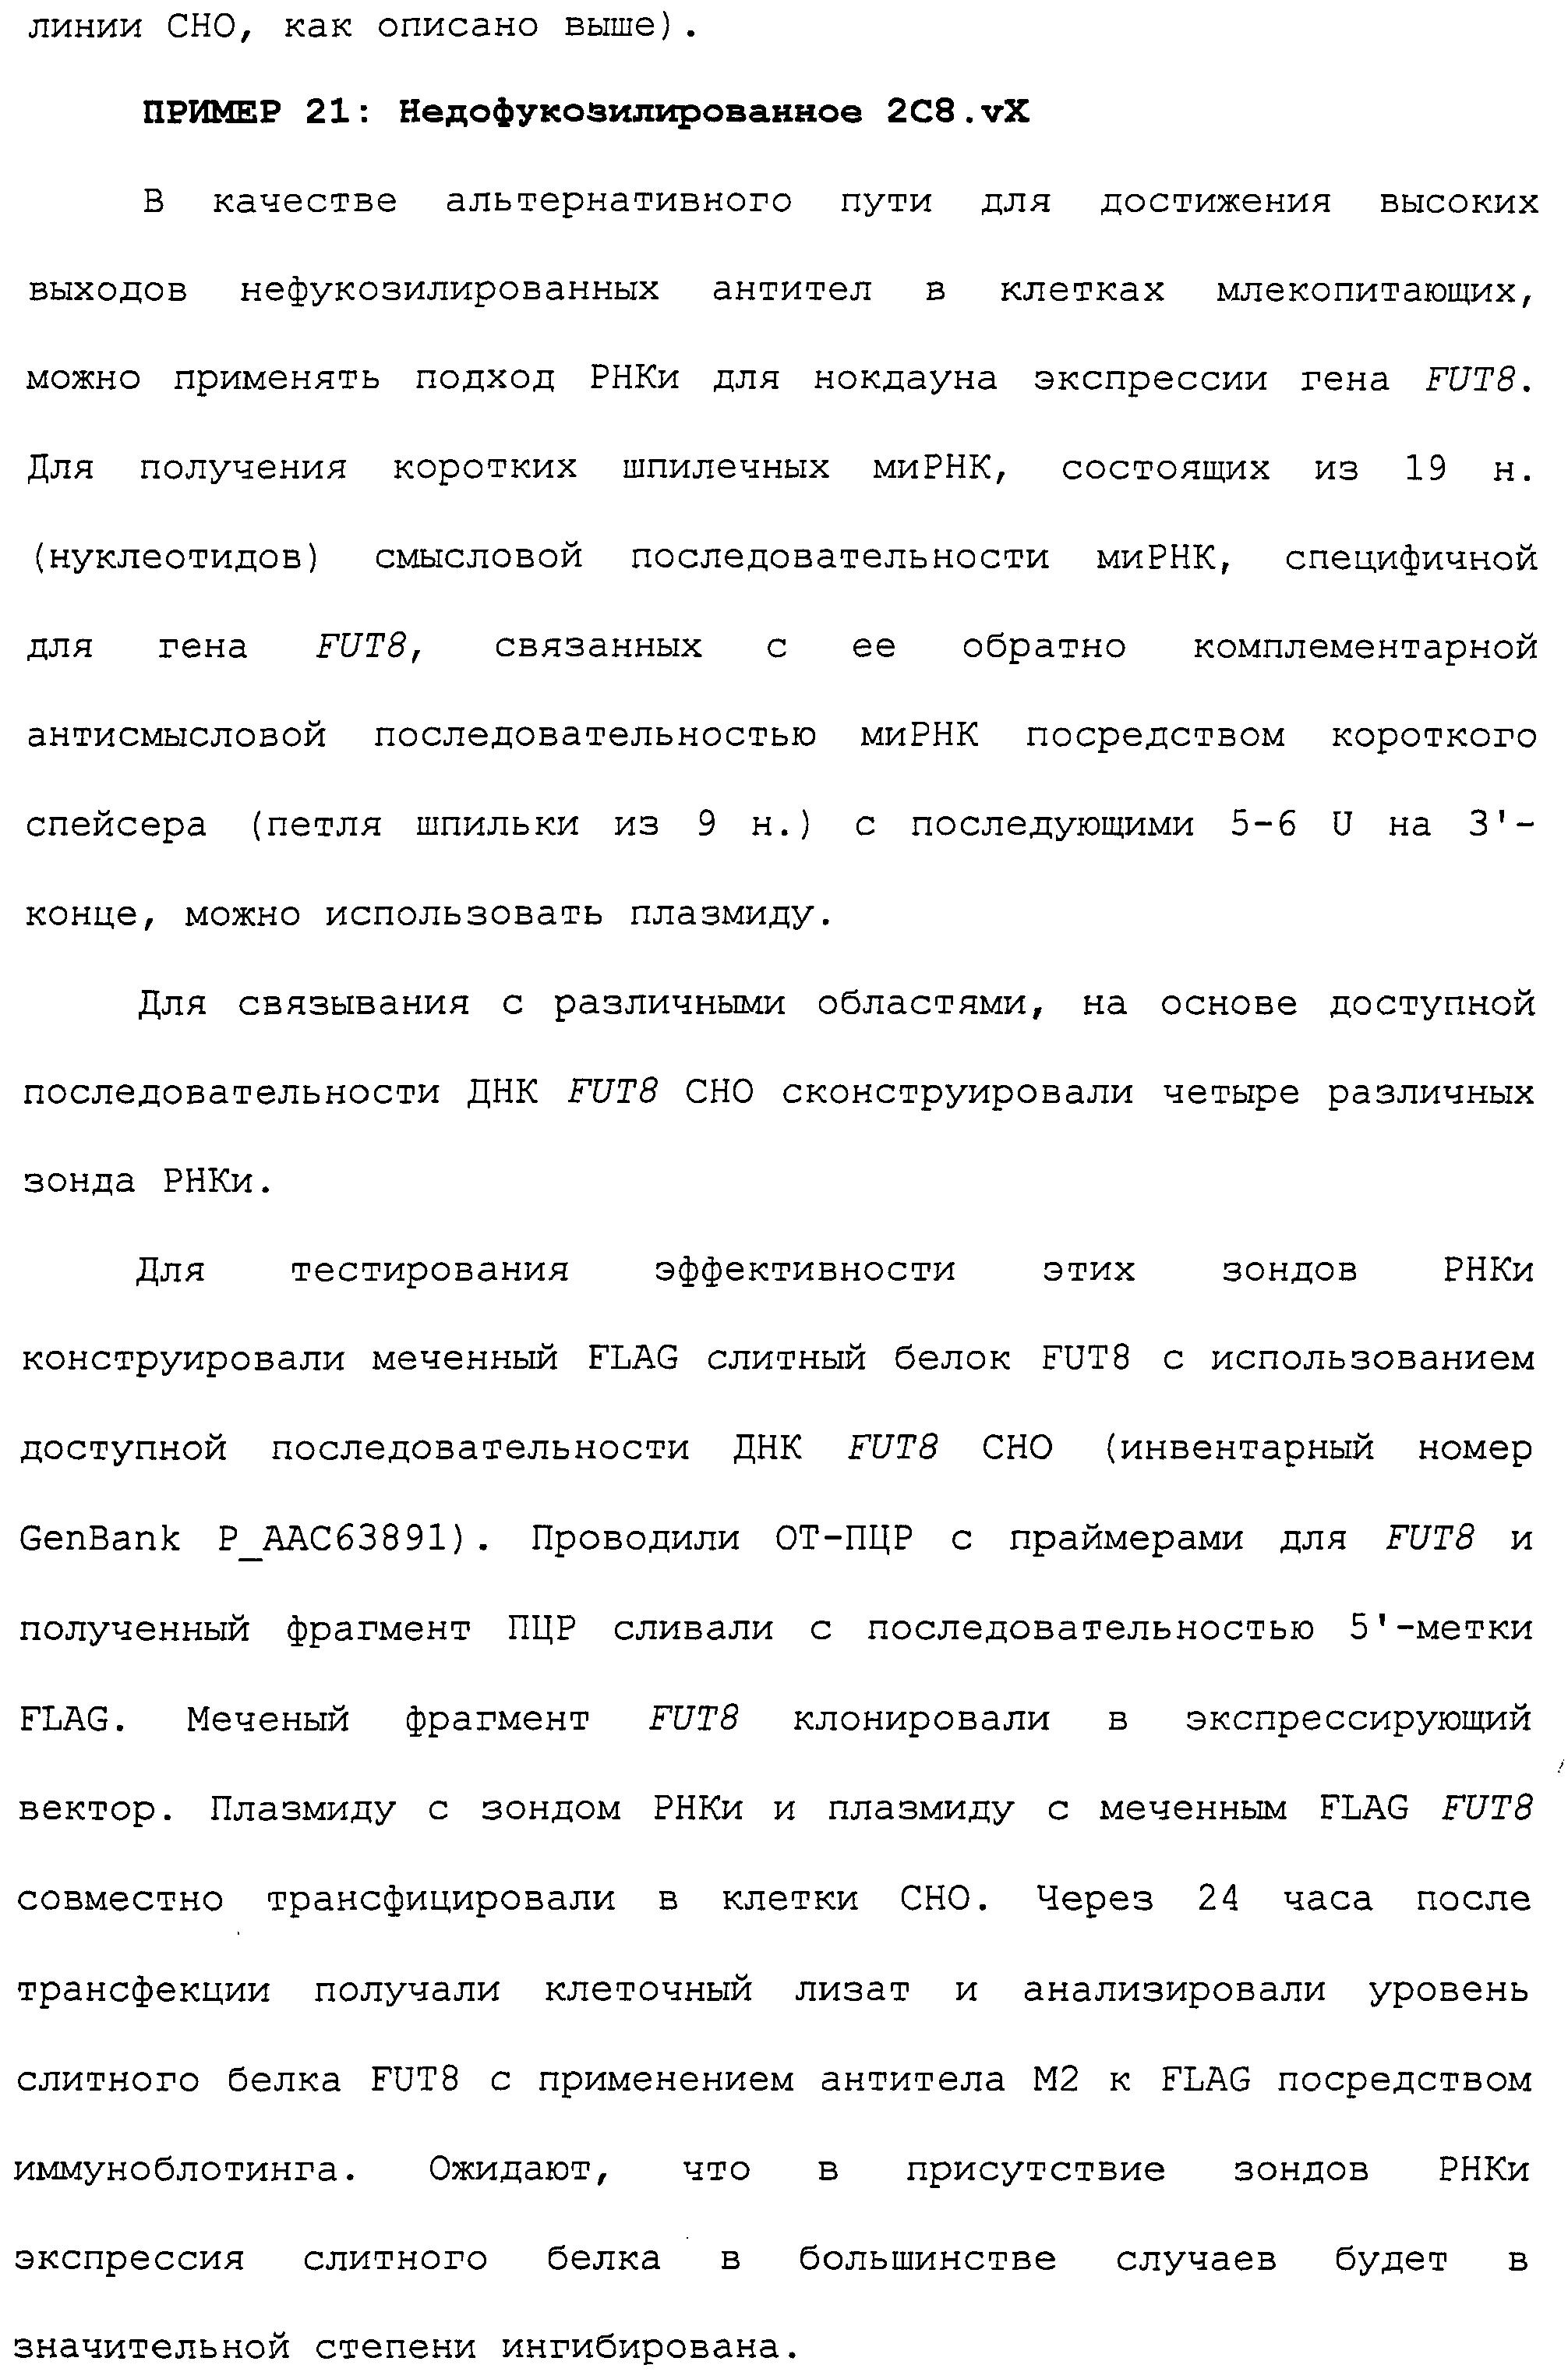 Figure 00000283